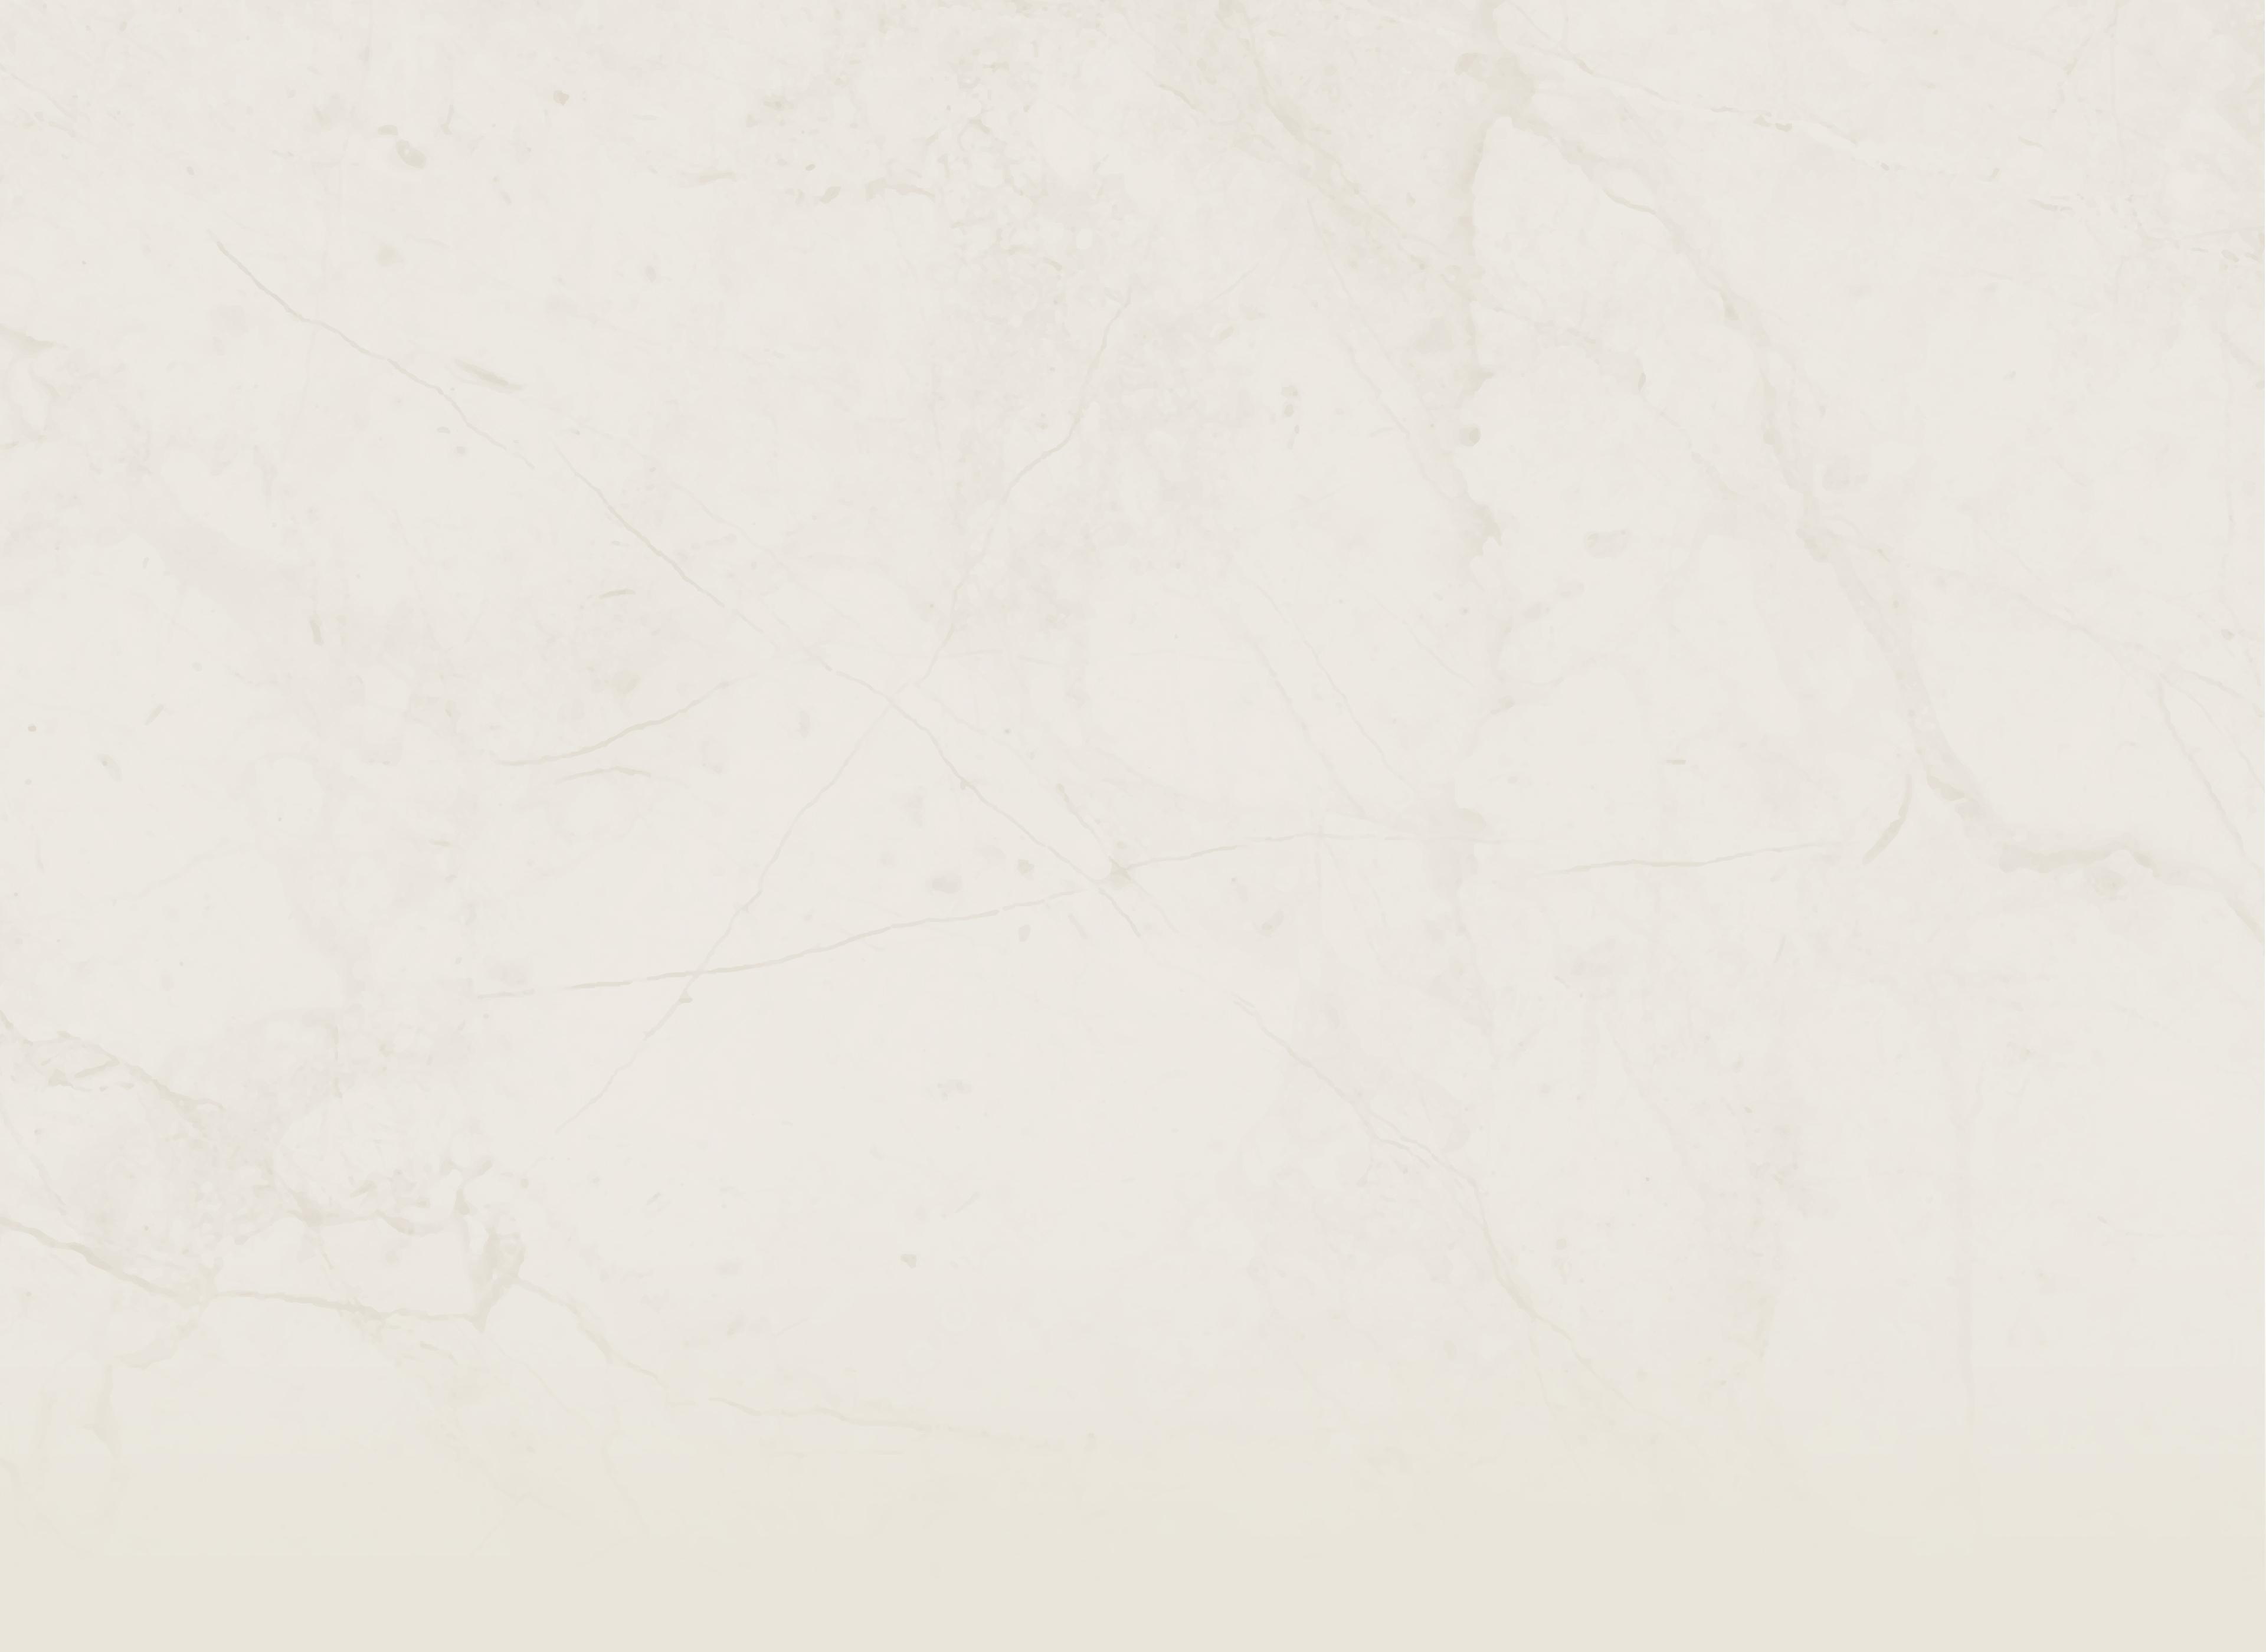 Apex light texture background image